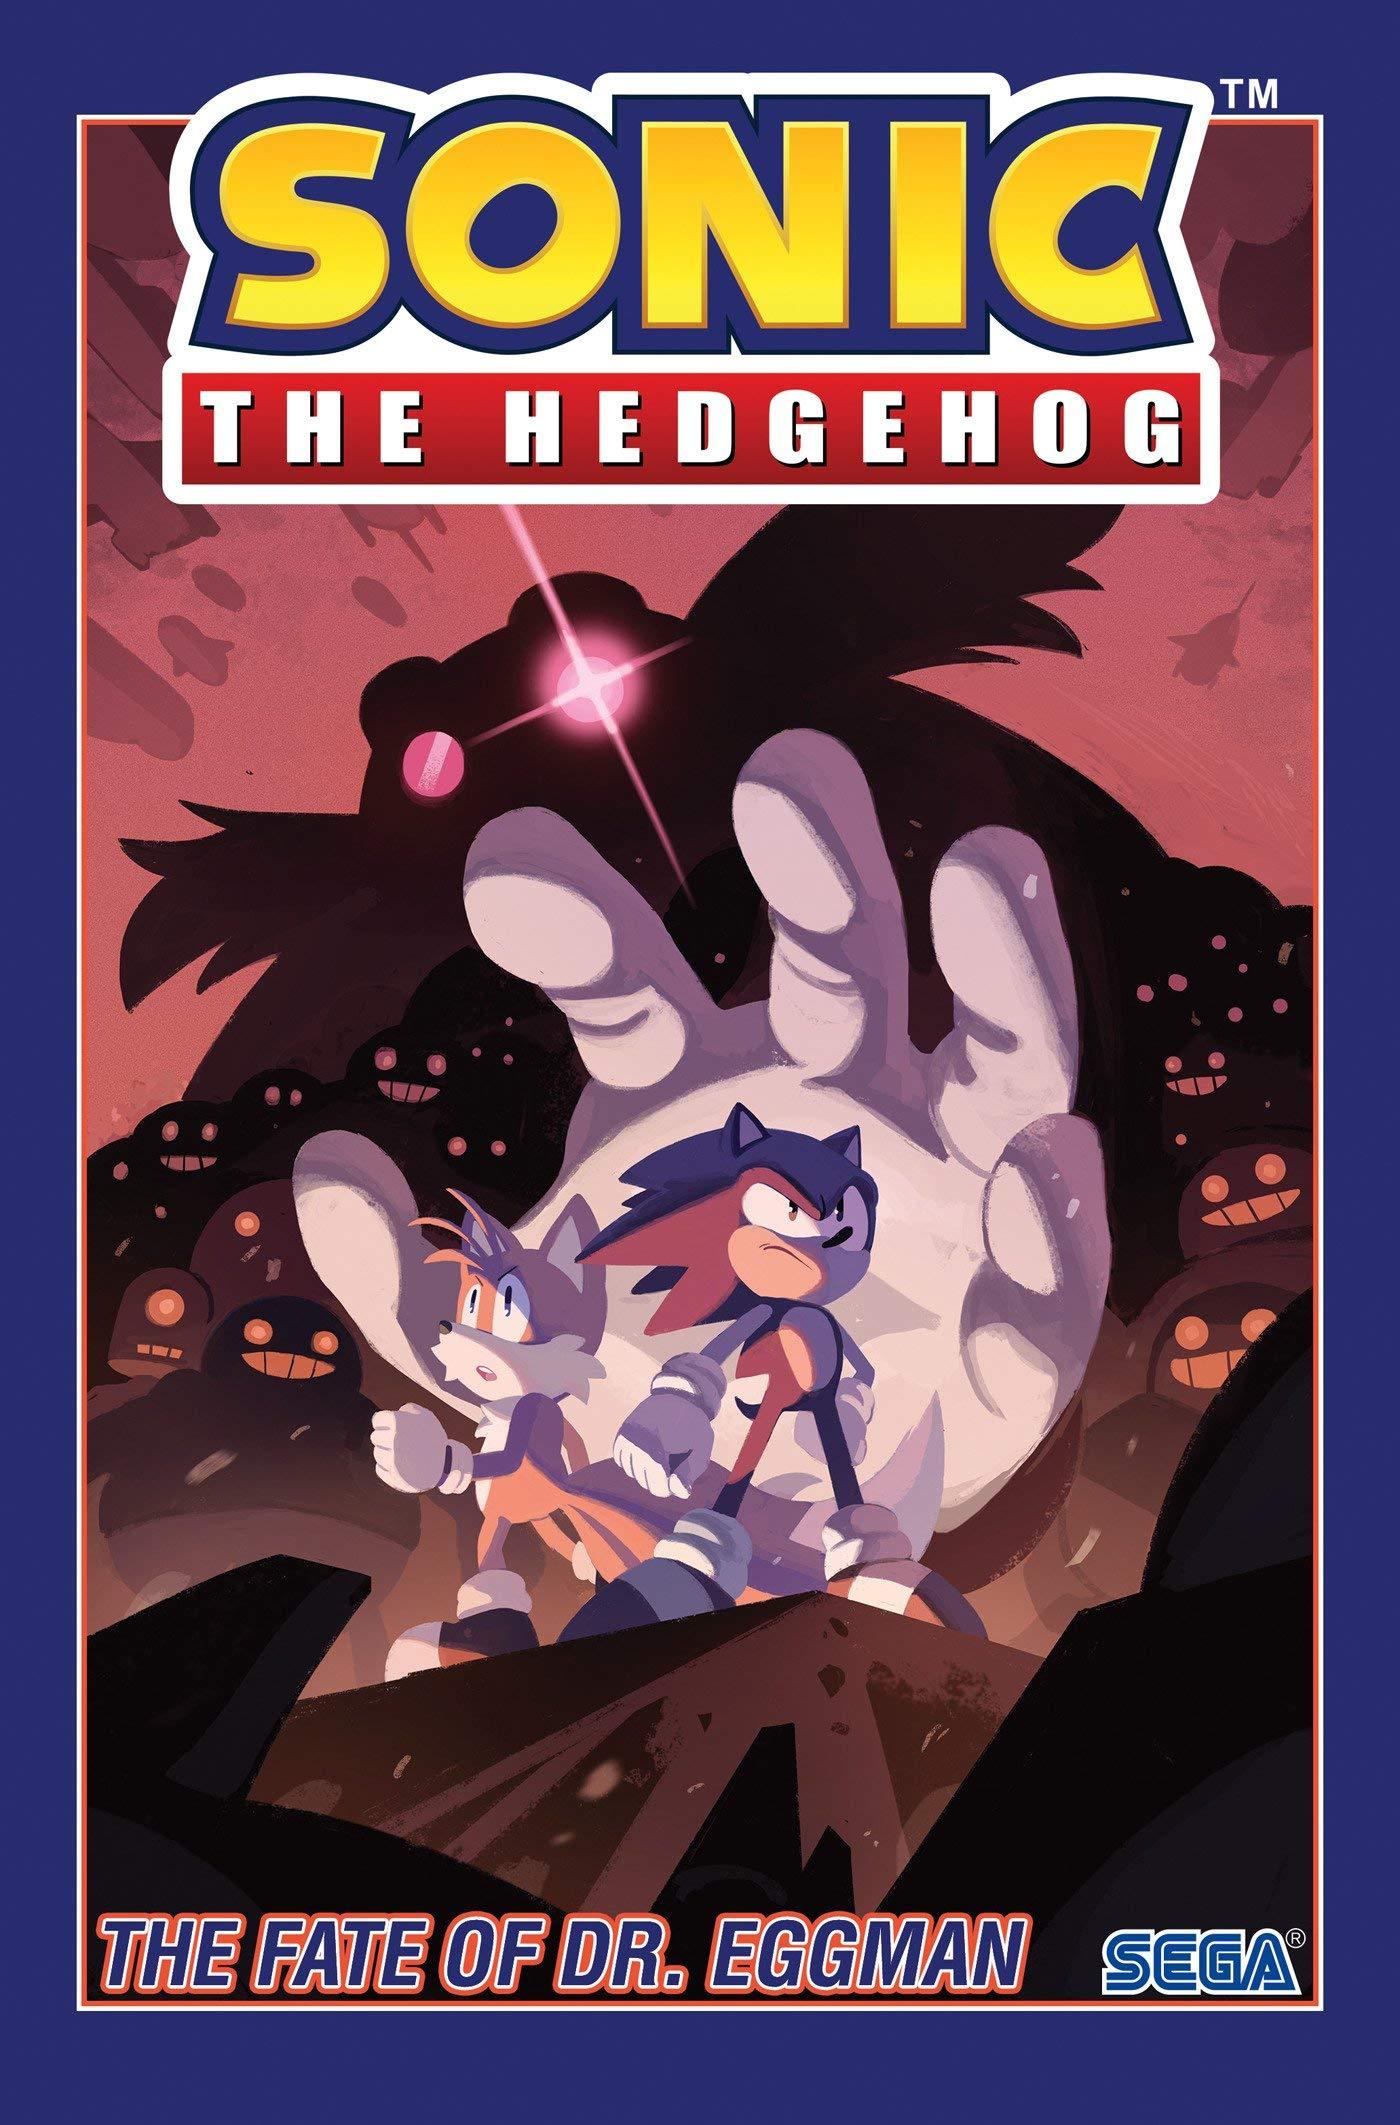 Amazon Com Sonic The Hedgehog Vol 2 The Fate Of Dr Eggman 9781684054060 Flynn Ian Yardley Tracy Thomas Adam Bryce Stanley Evan Books